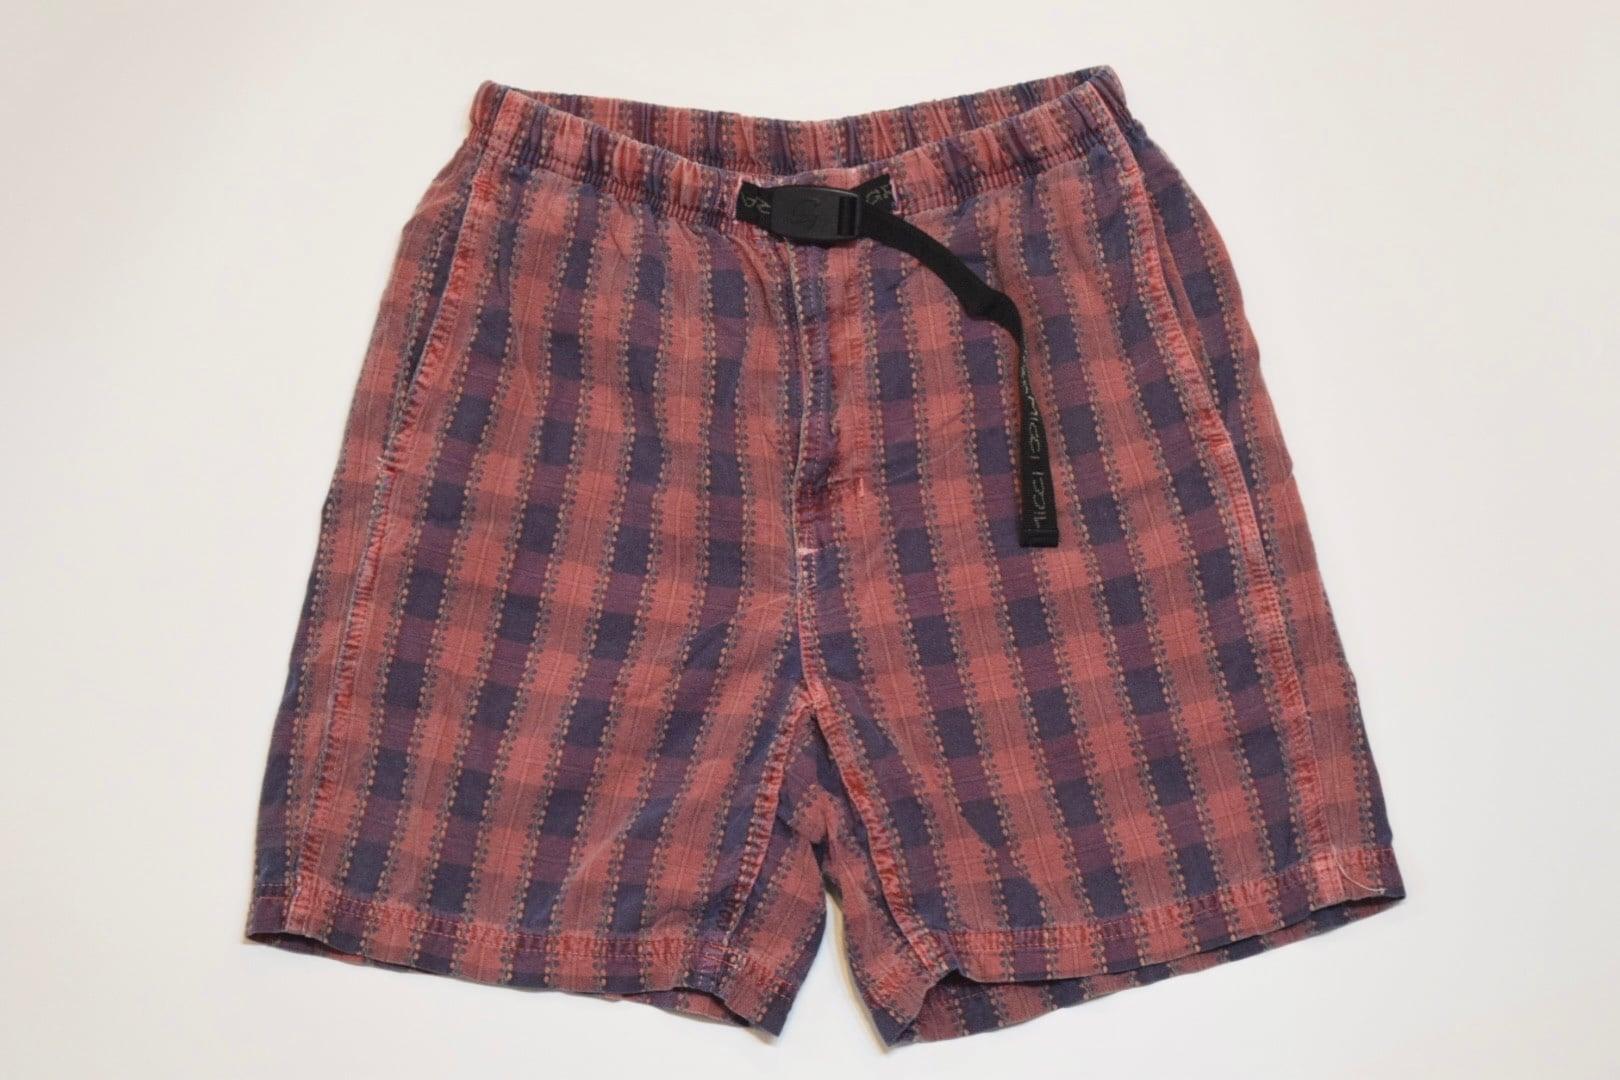 USED 90s Gramicci shorts -Women S 01129